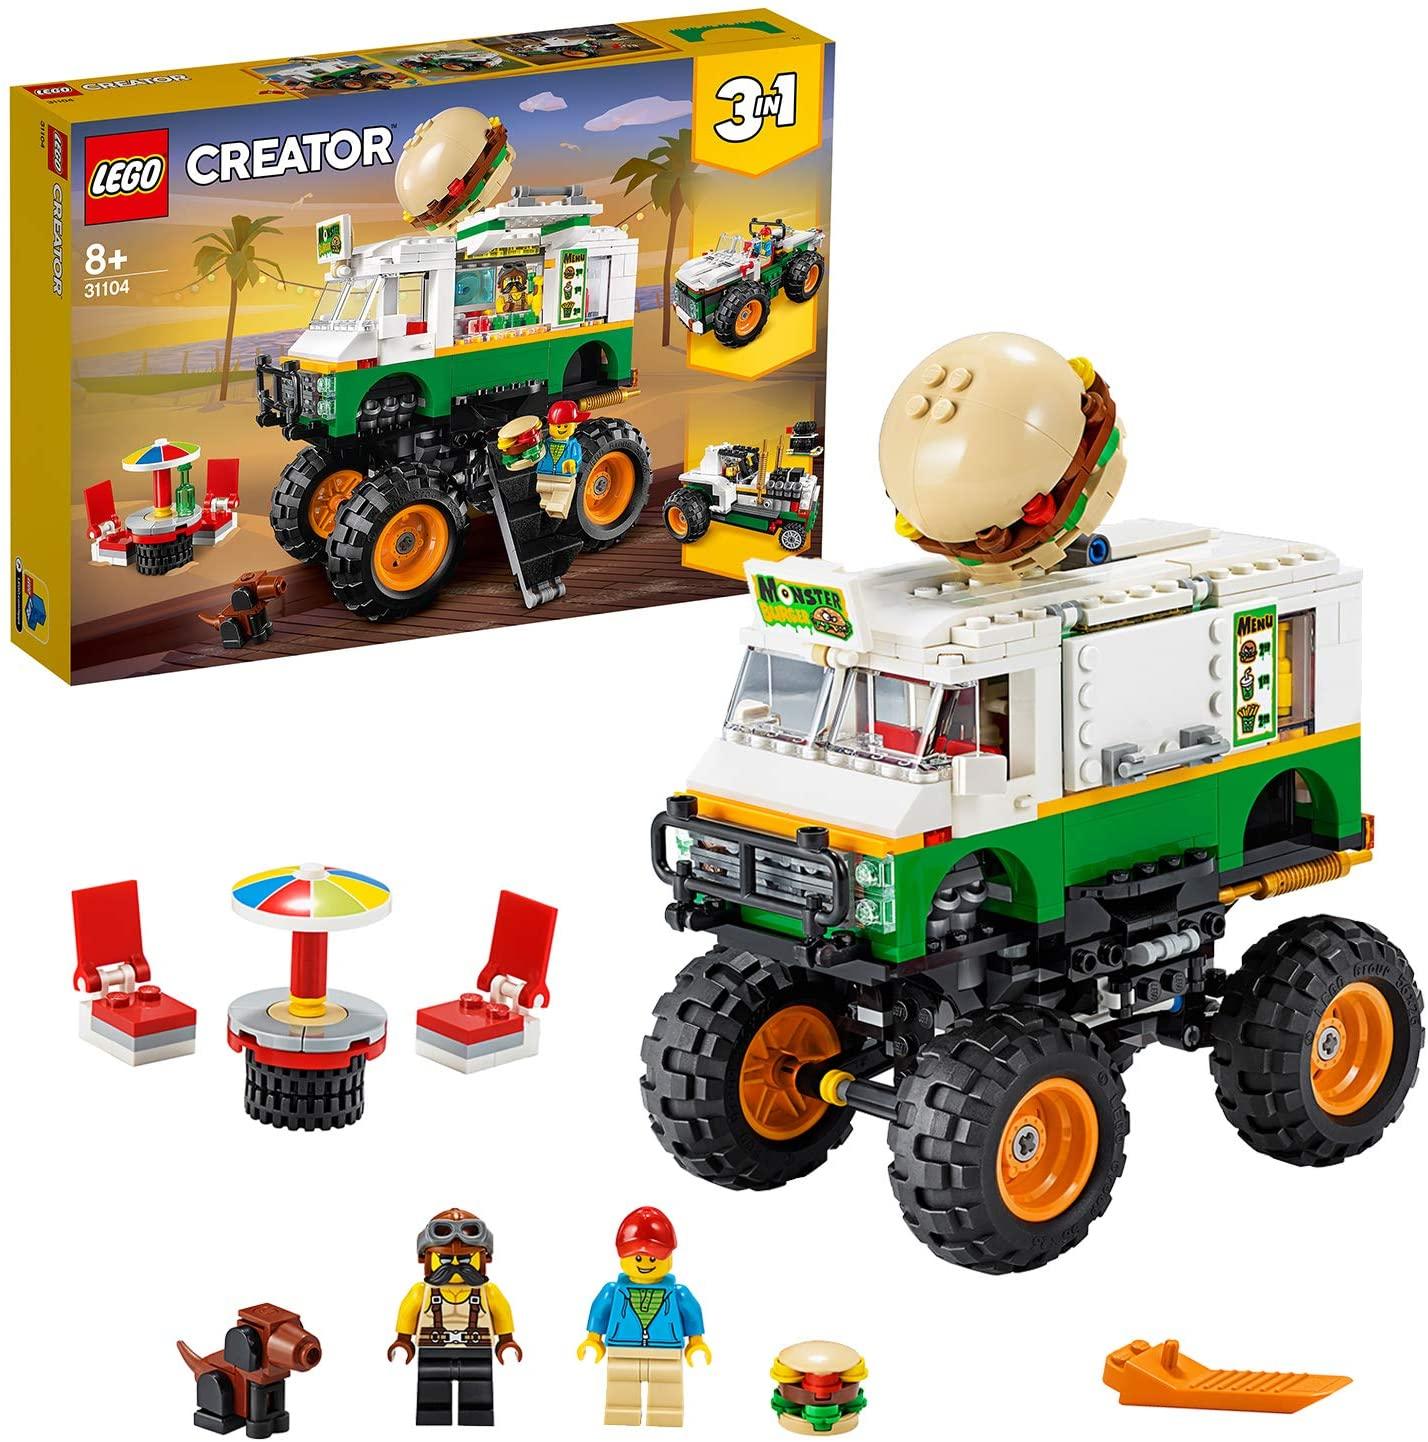 Lego Creator 31104 - Monster Burger Truck